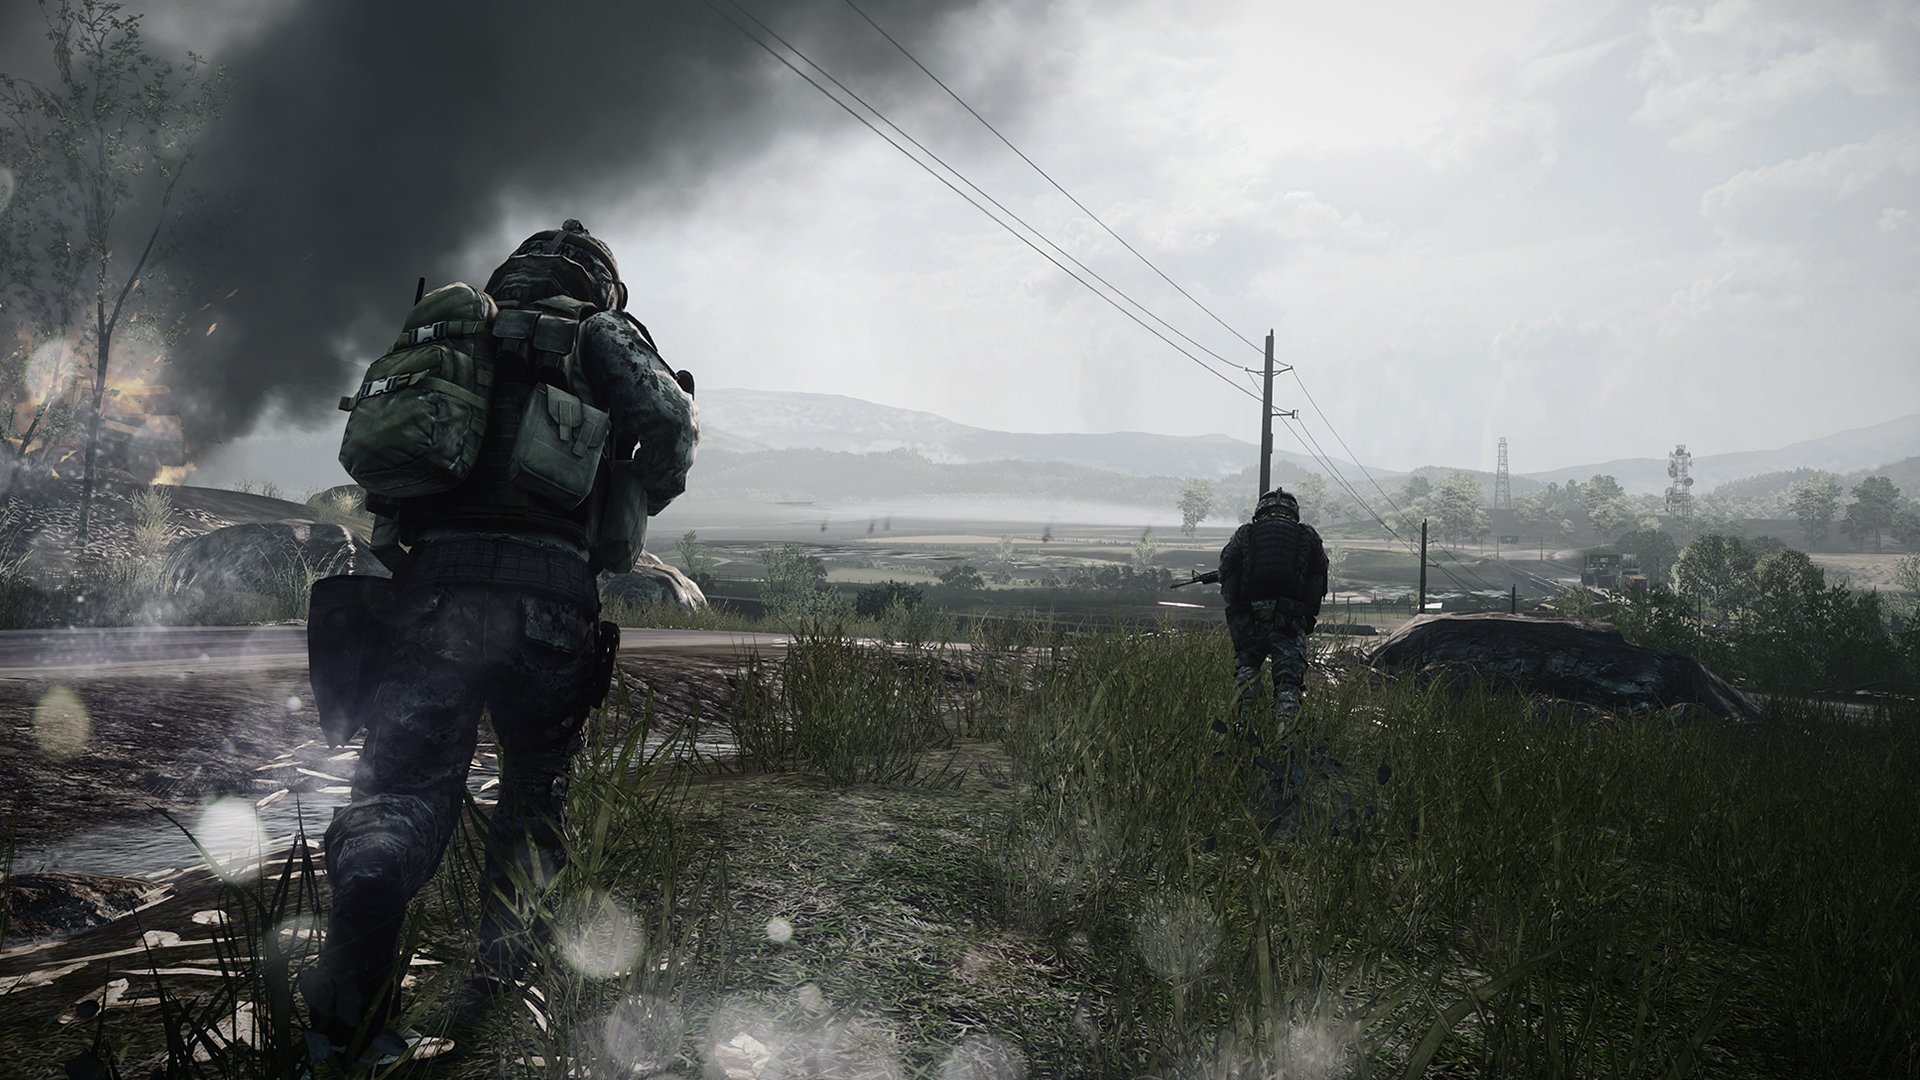 Battlefield 3 - MP screens - 10.24 - Valley03